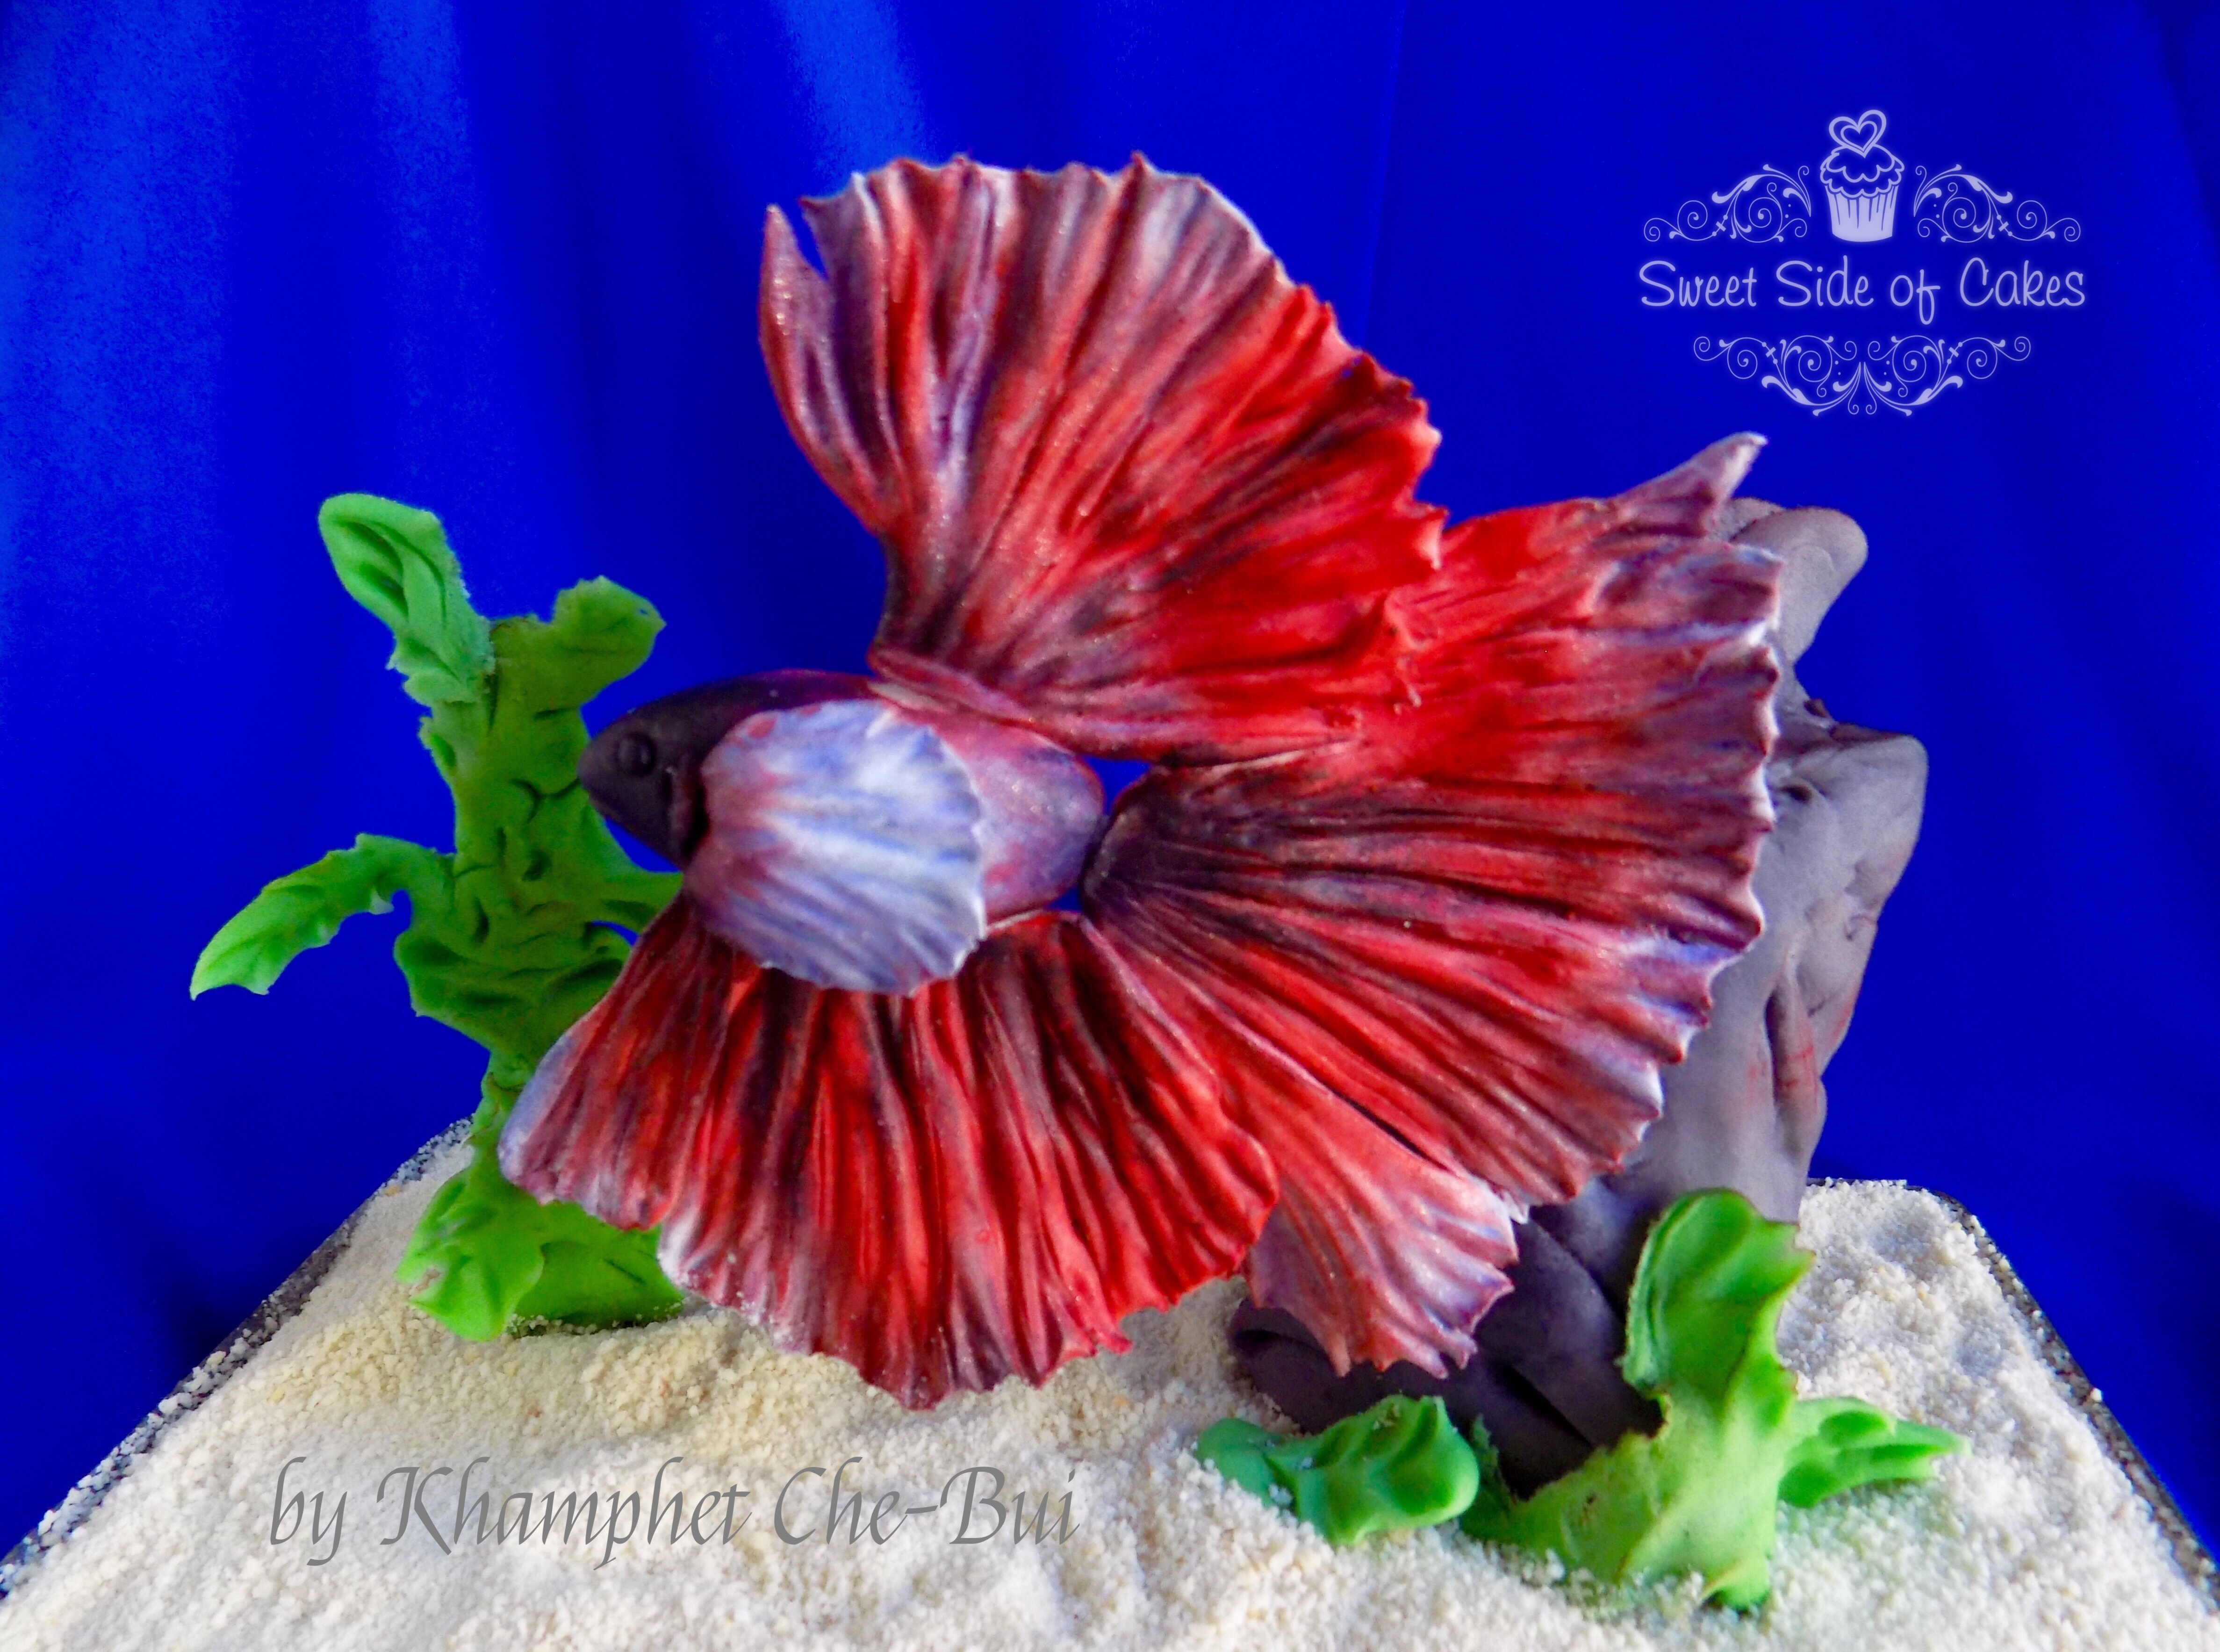 Animal-Rights-Khamphet-Che-Bui-Sweet-Side-Of-Cakes-Betta-Fish.jpeg#asset:13722